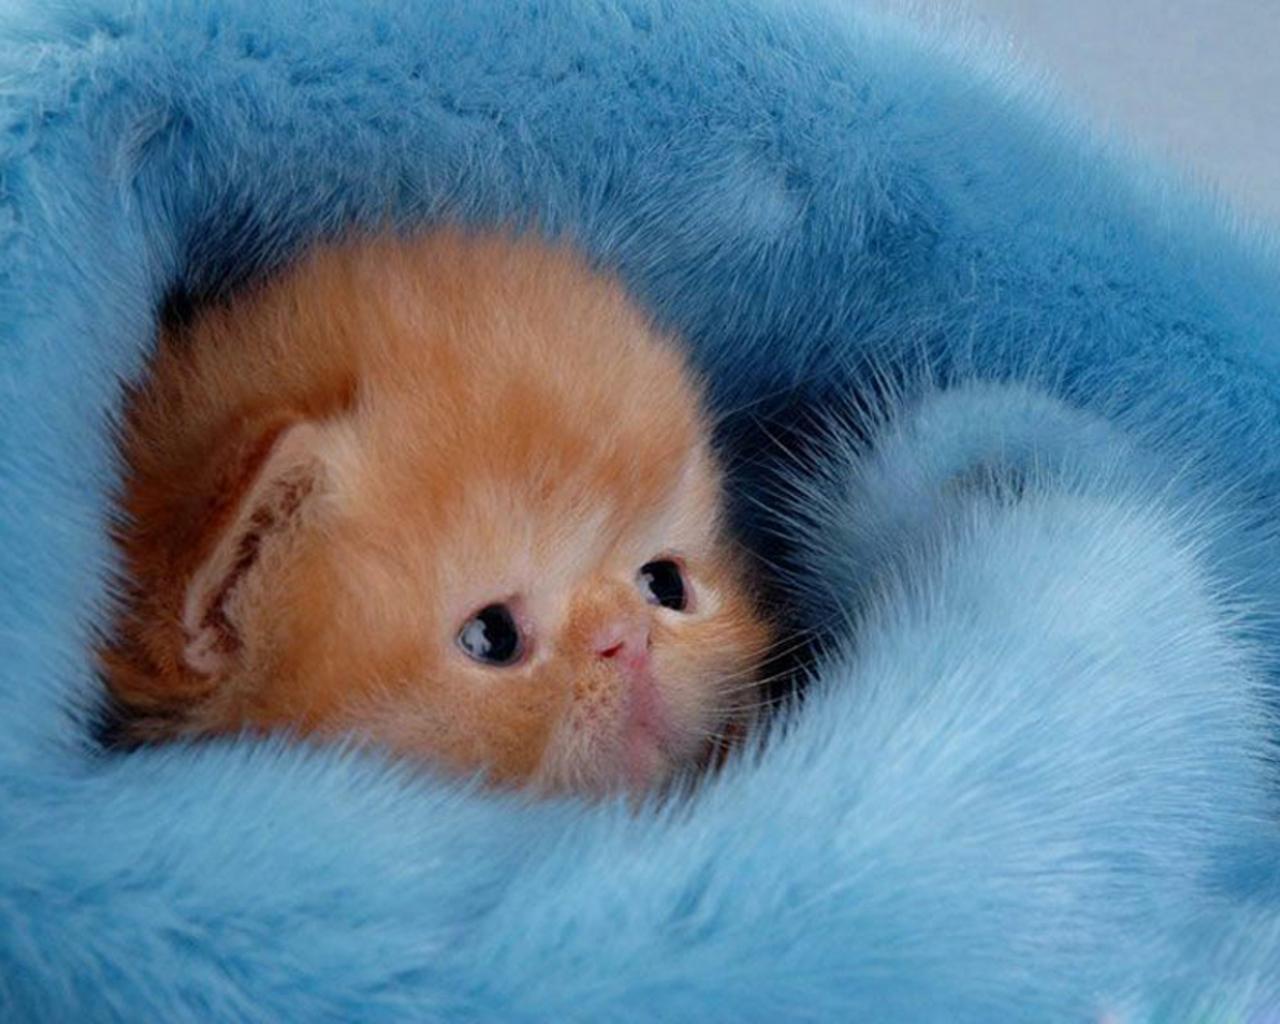 adorable kitten small Wallpaper 1280x1024